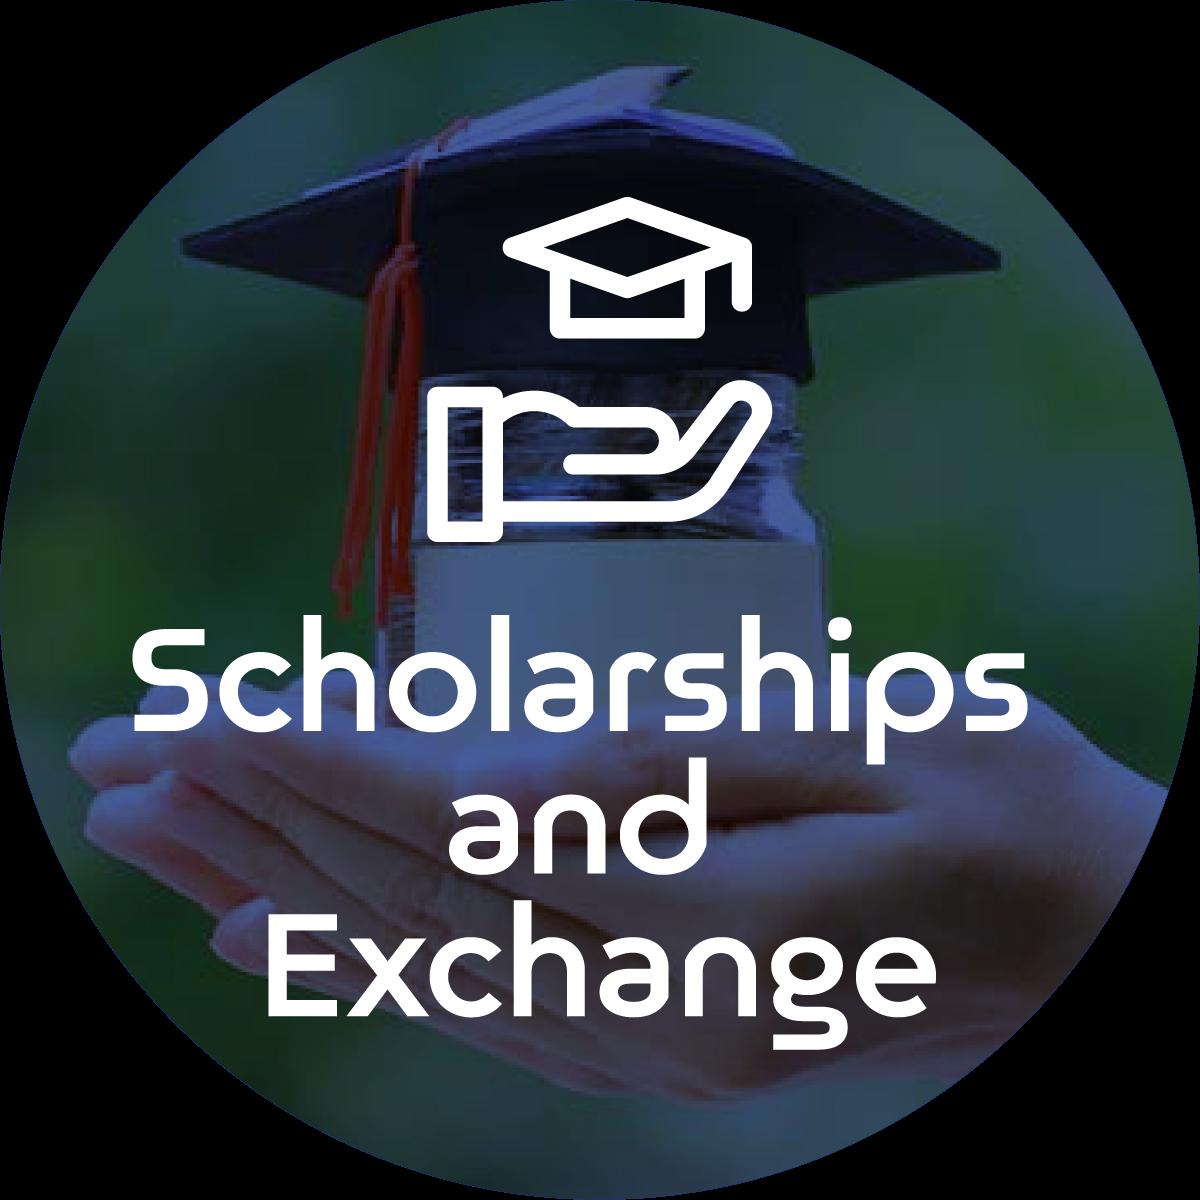 Scholarships and Exchange programmes